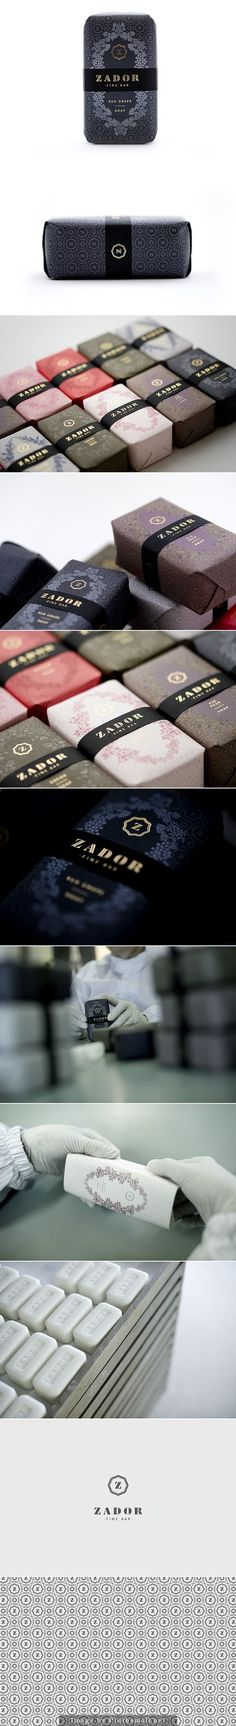 Zador - Fine bar soap